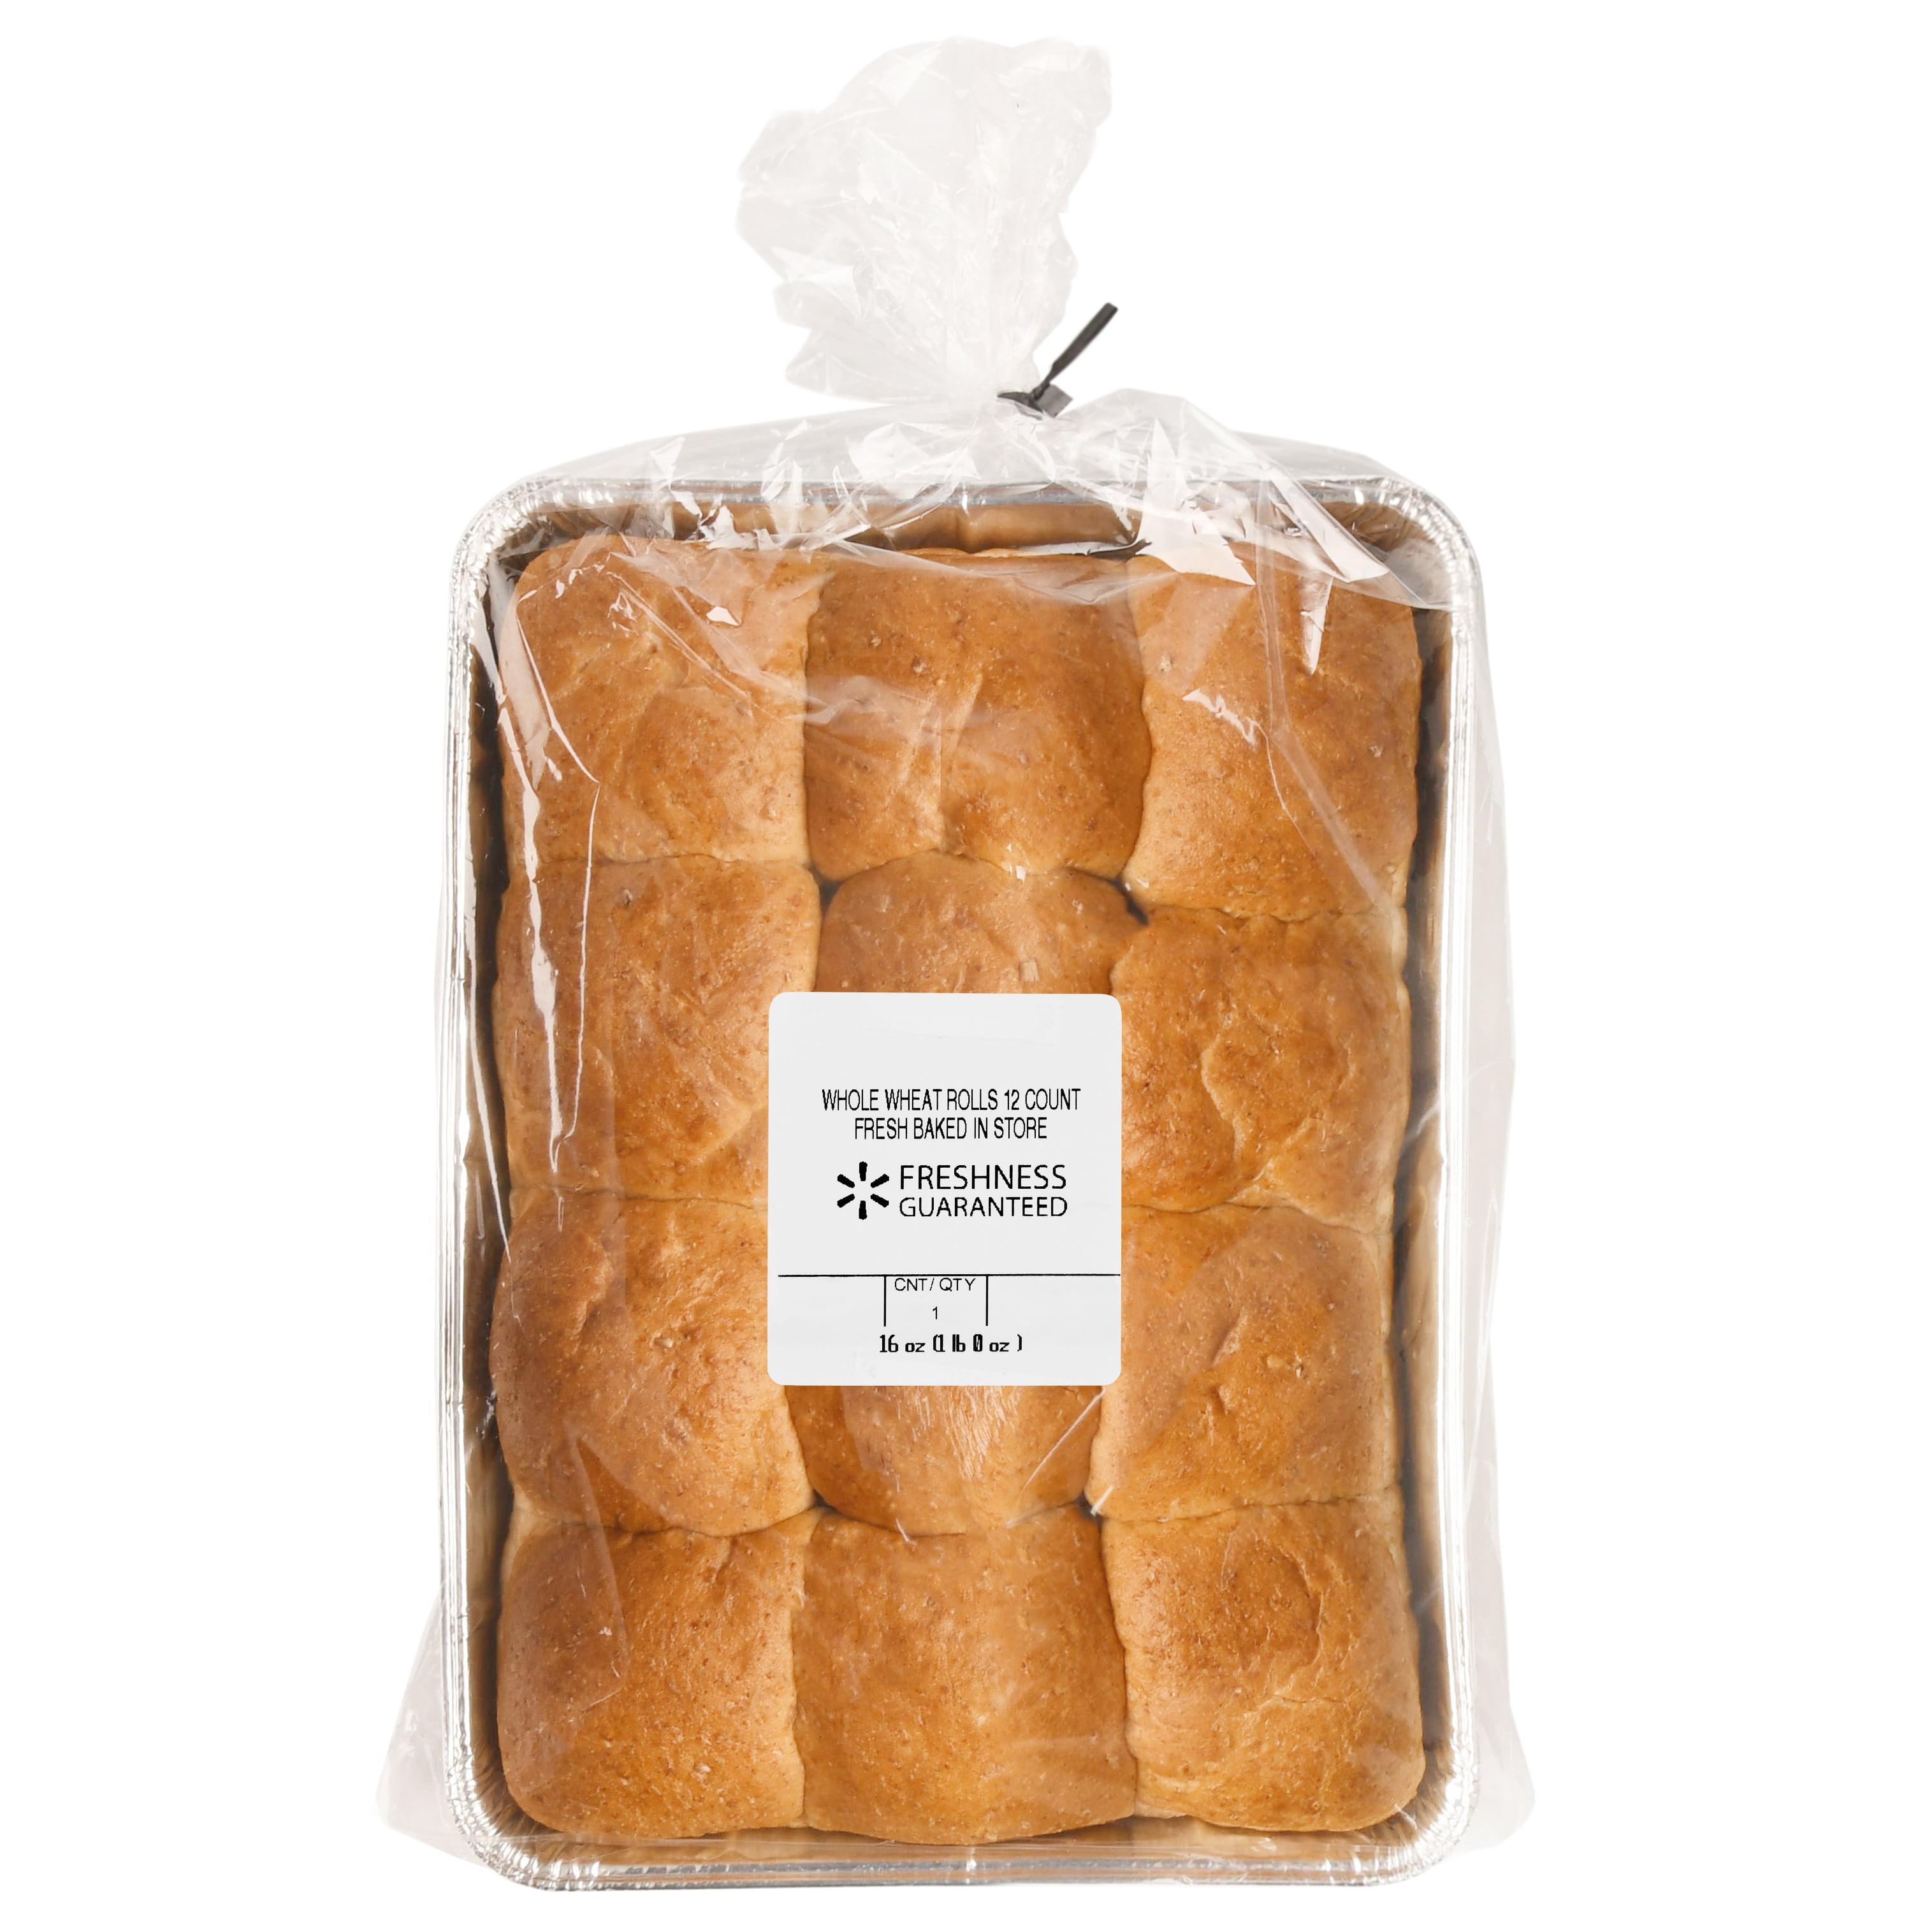 Freshness Guaranteed Whole Wheat Rolls, 16 oz, 12 Count